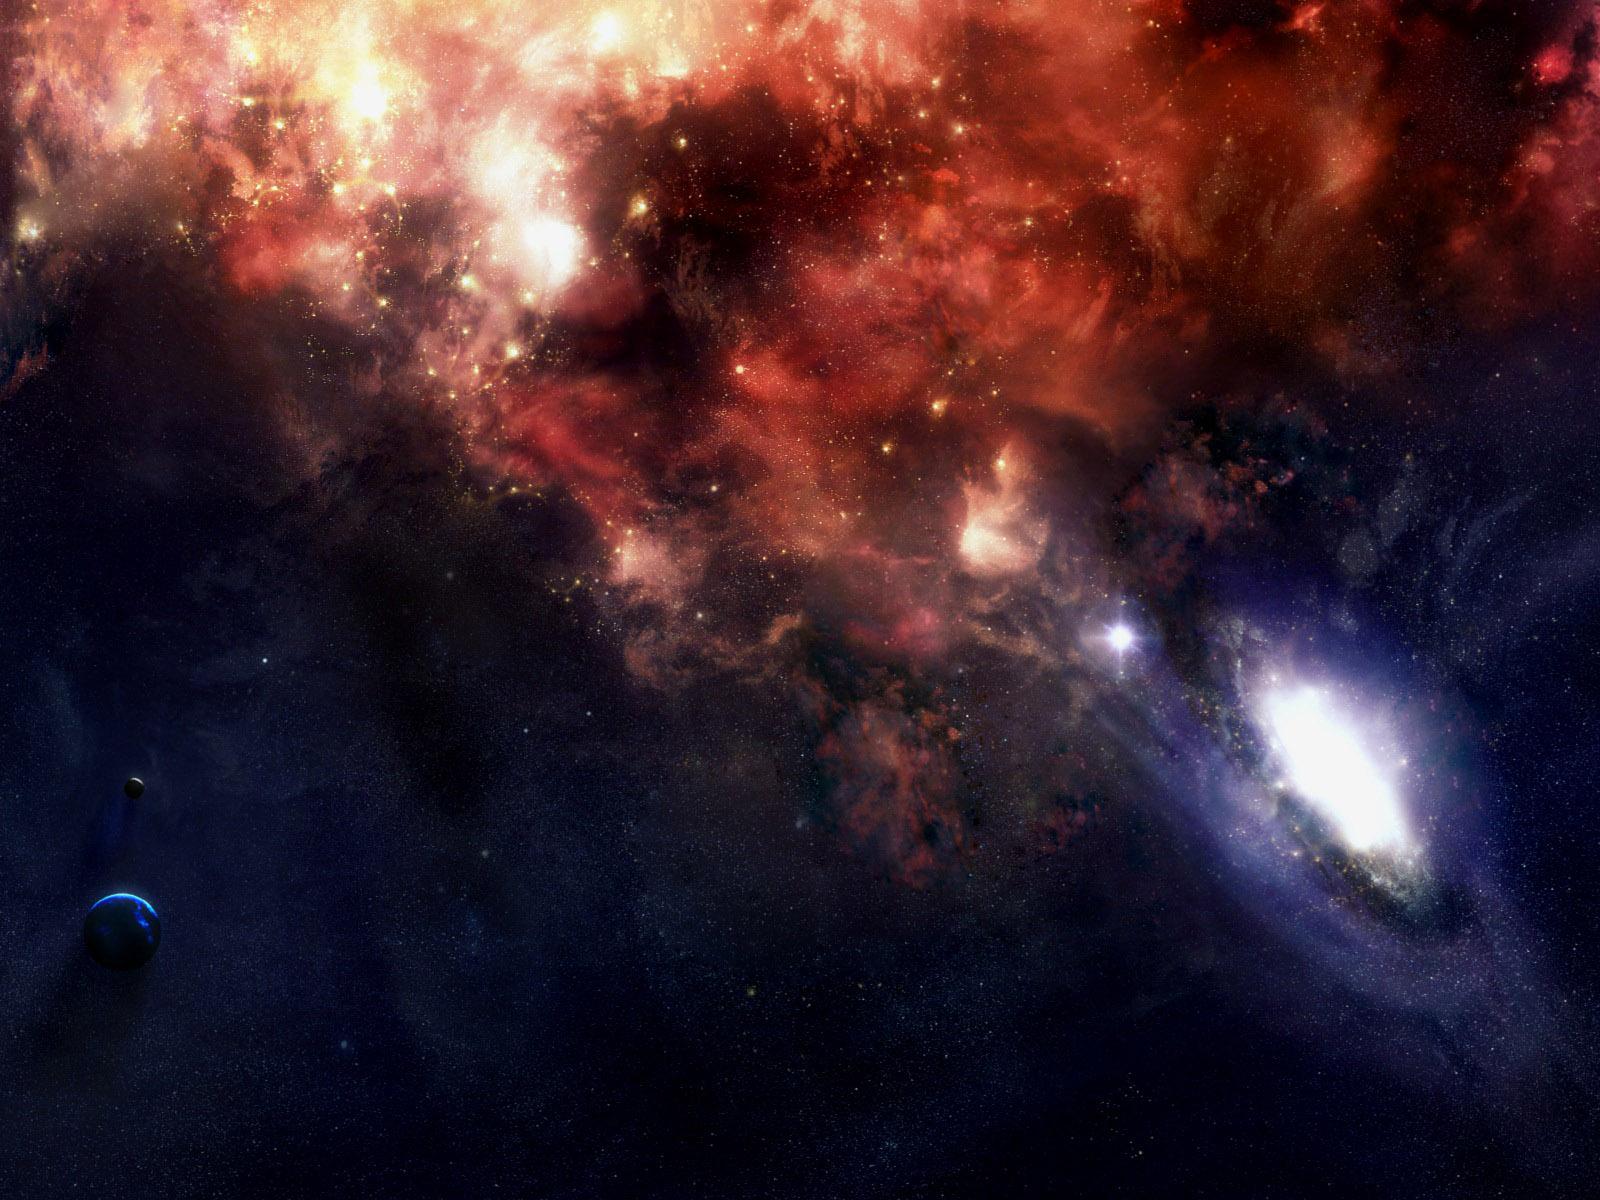 galaxy-wallpaper-background-HD